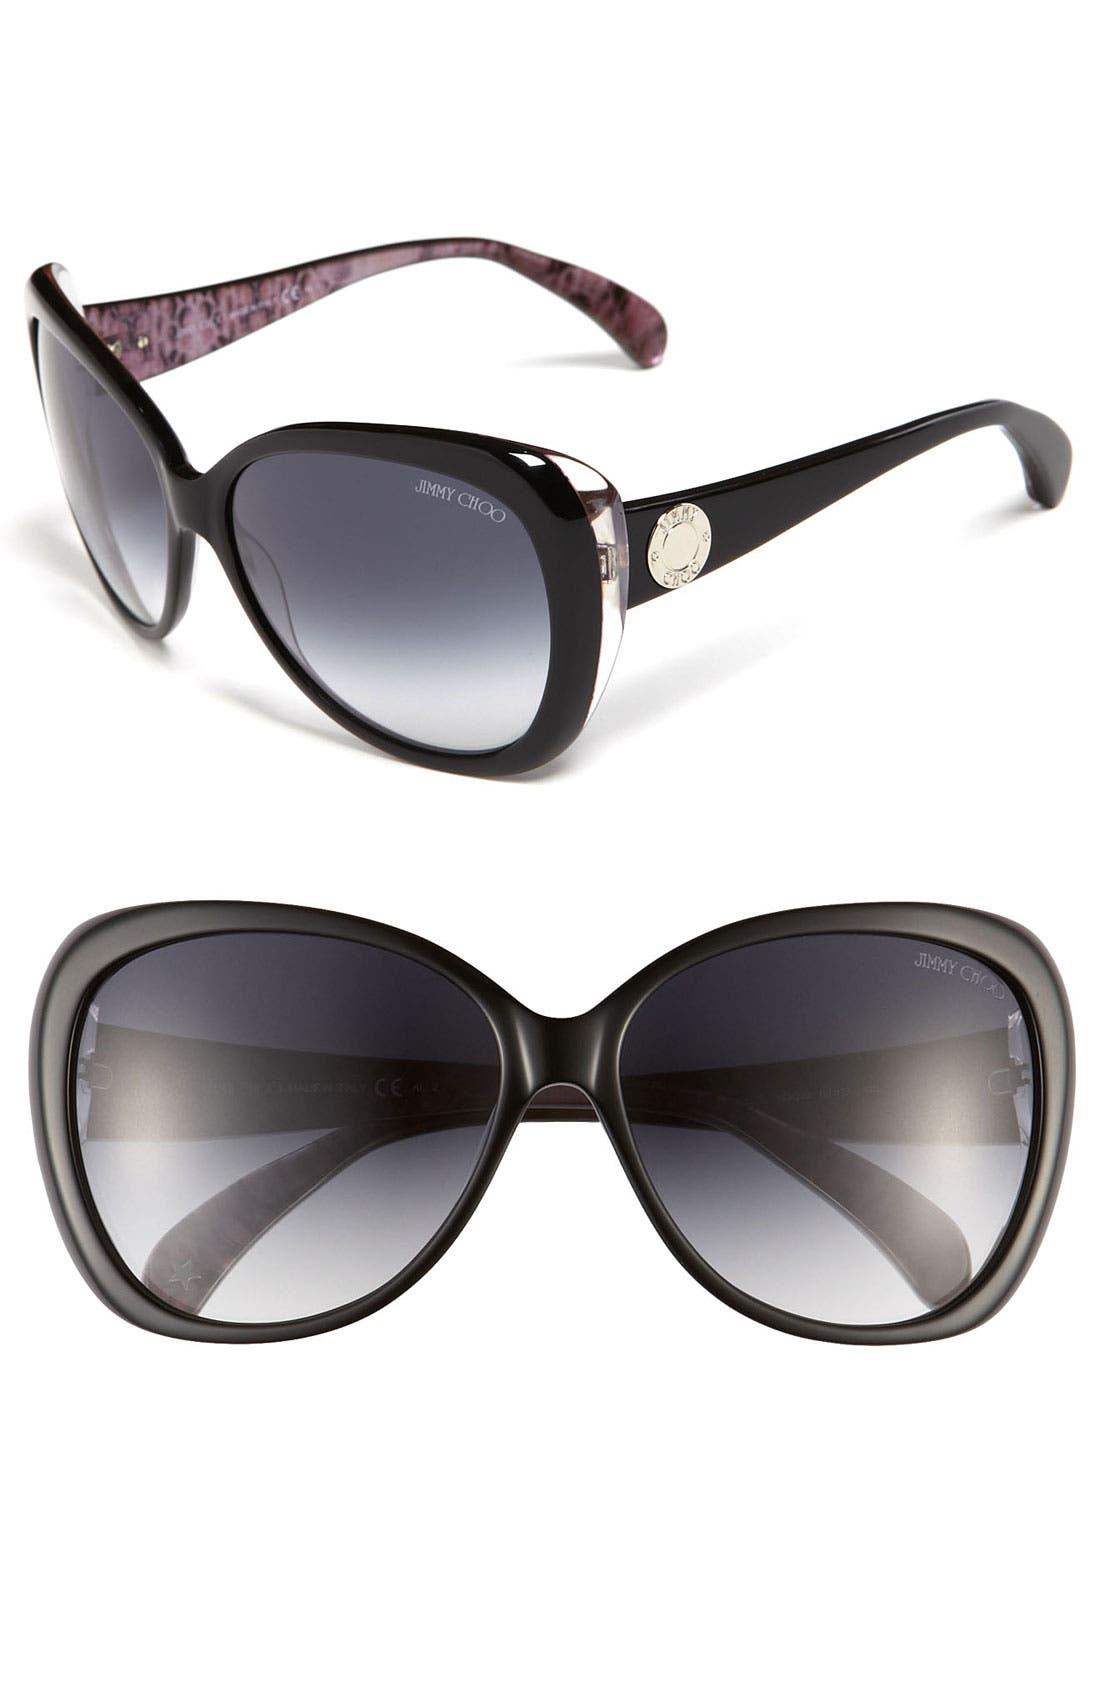 Alternate Image 1 Selected - Jimmy Choo 'Julie' Cat's Eye Sunglasses